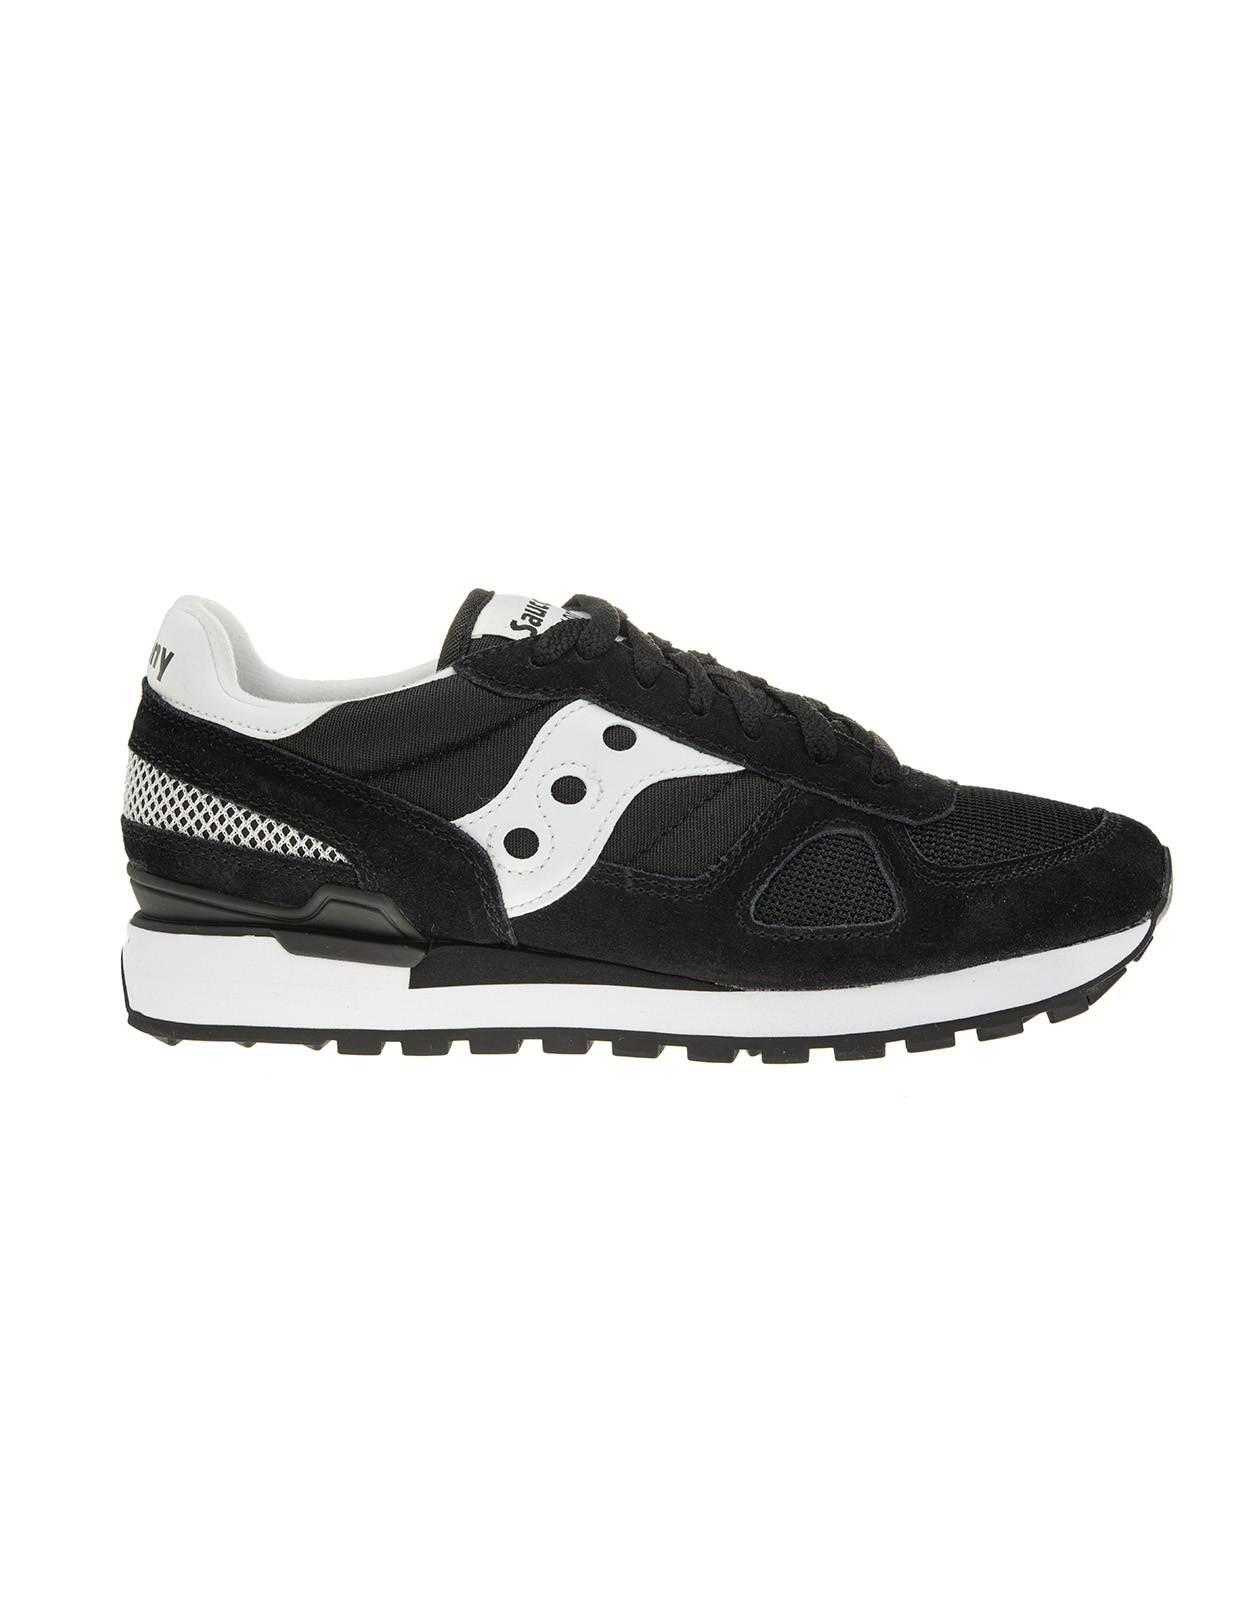 new product cb1ee 5778f Saucony Originals Shadow O' Black/White